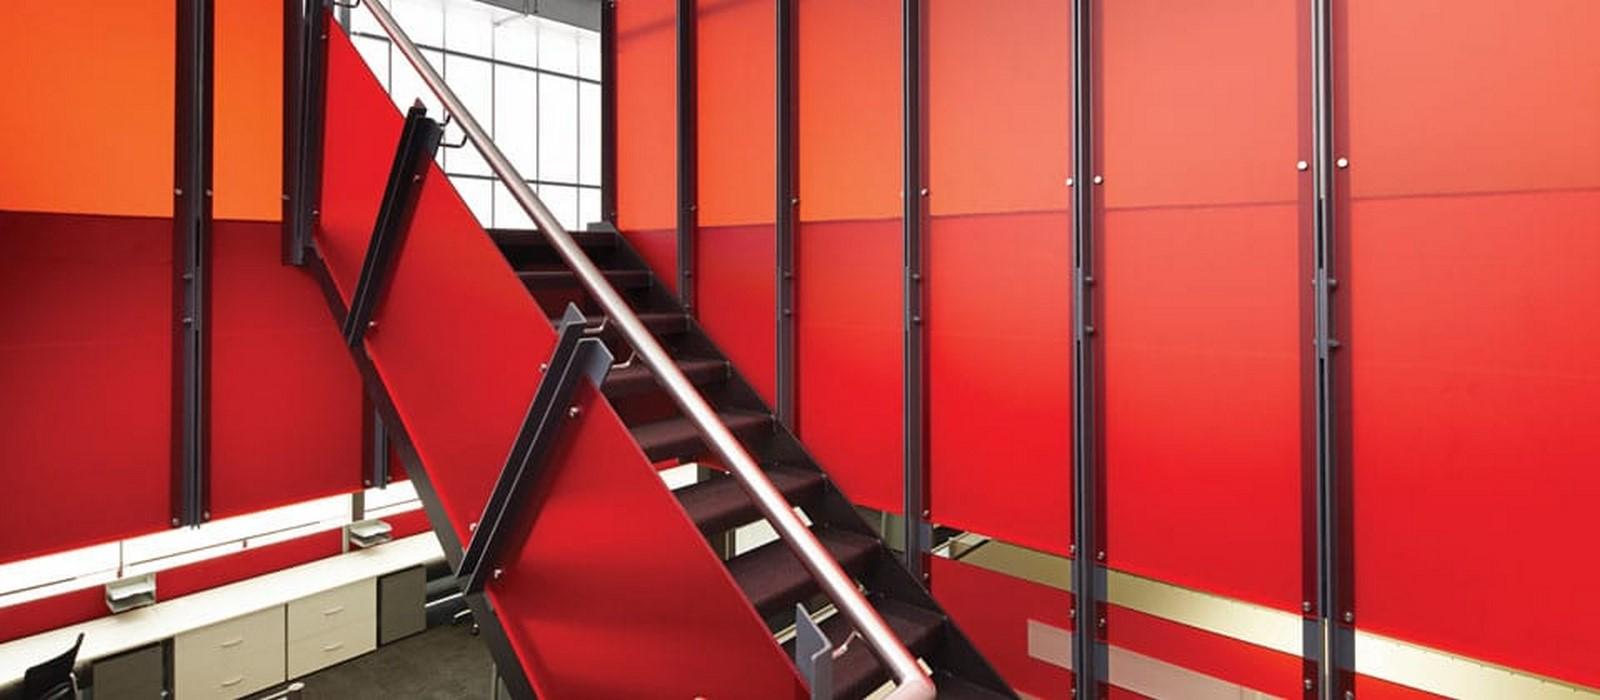 SEW Eurodrive Office and Warehouse, Welshpool, Western Australia - Sheet3